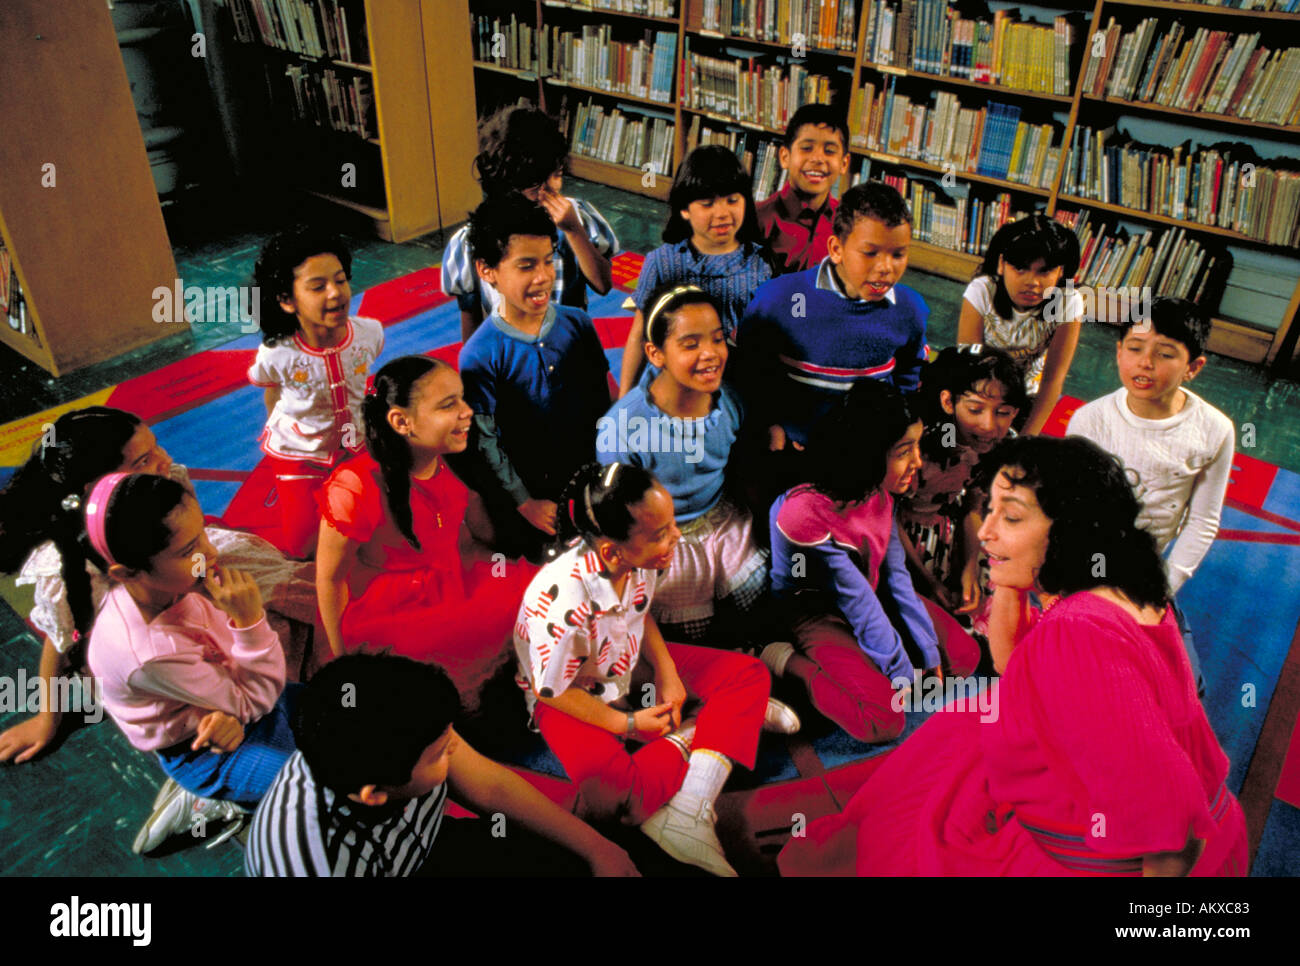 THIRD GRADE CLASS IN SPANISH HARLEM REPEATS A POEM FOR THEIR TEACHER THIRD GRADE CLASS and TEACHER, NEW YORK - Stock Image